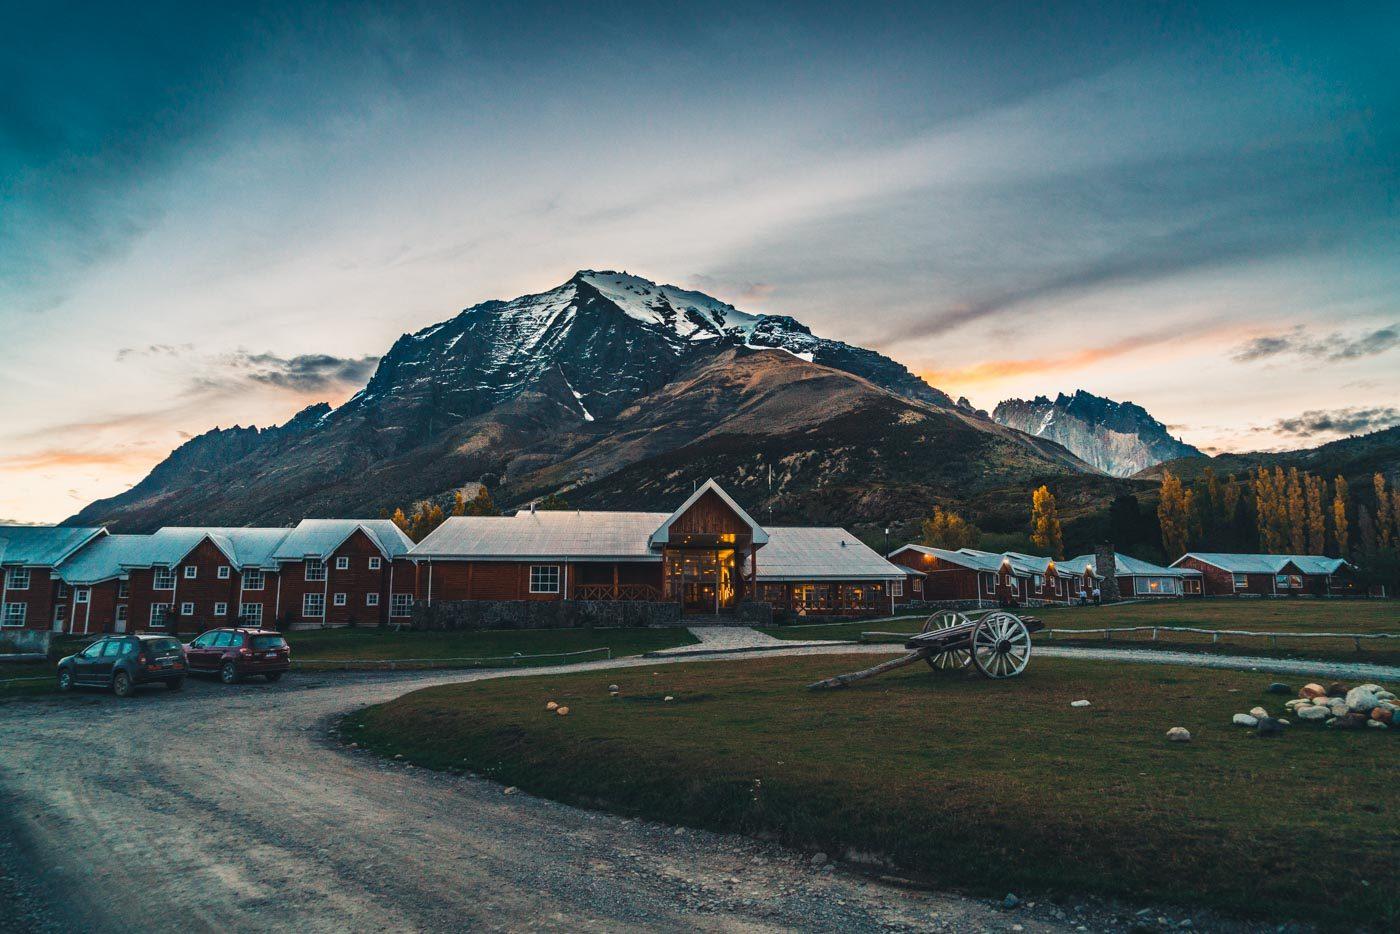 Las Torres Hotel at sunset, Torres del Paine National Park